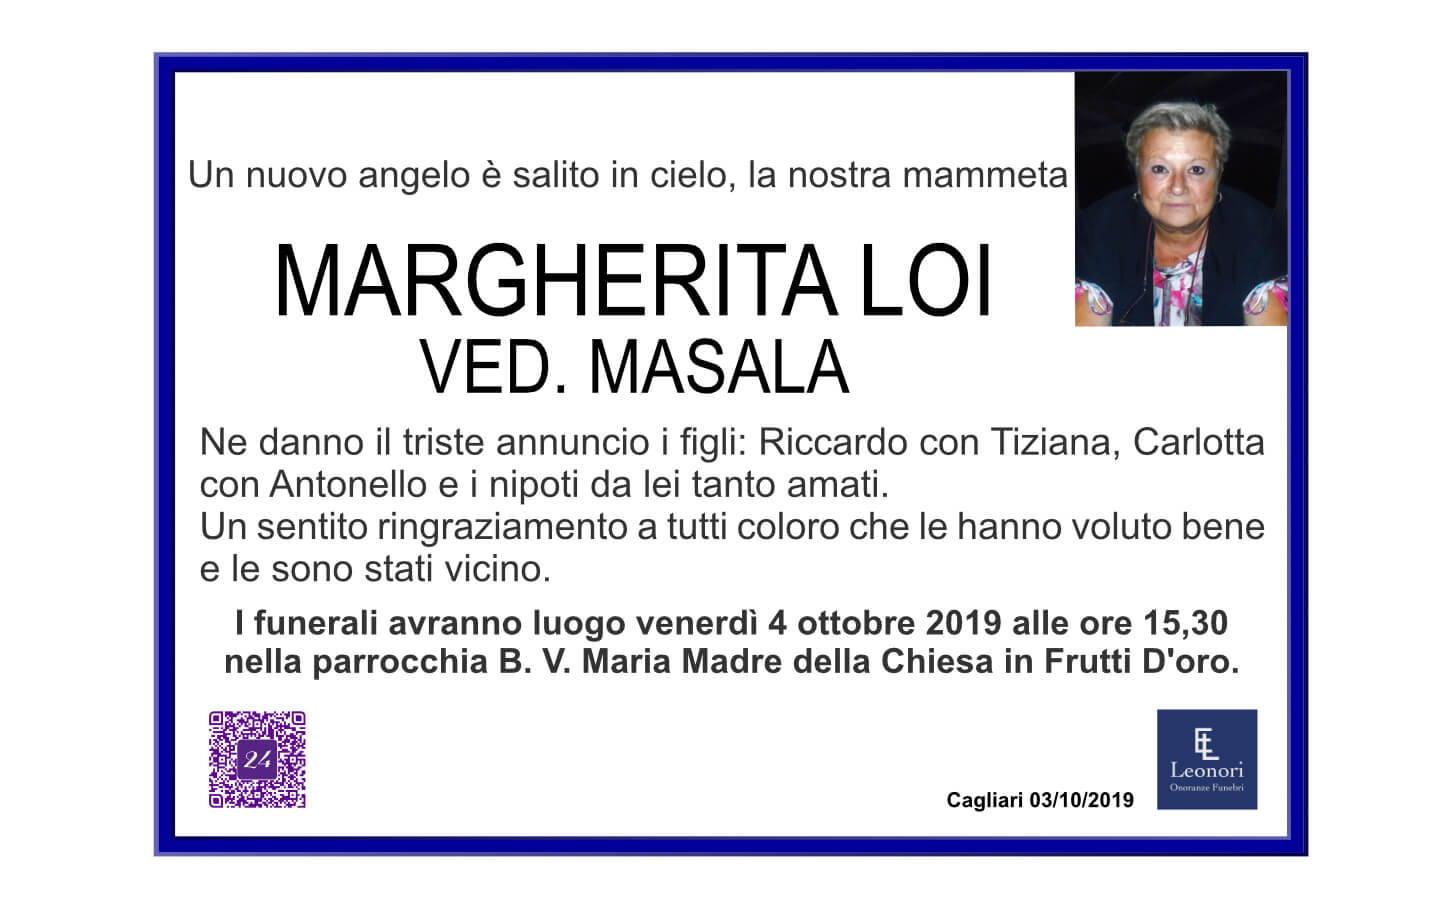 Margherita Loi